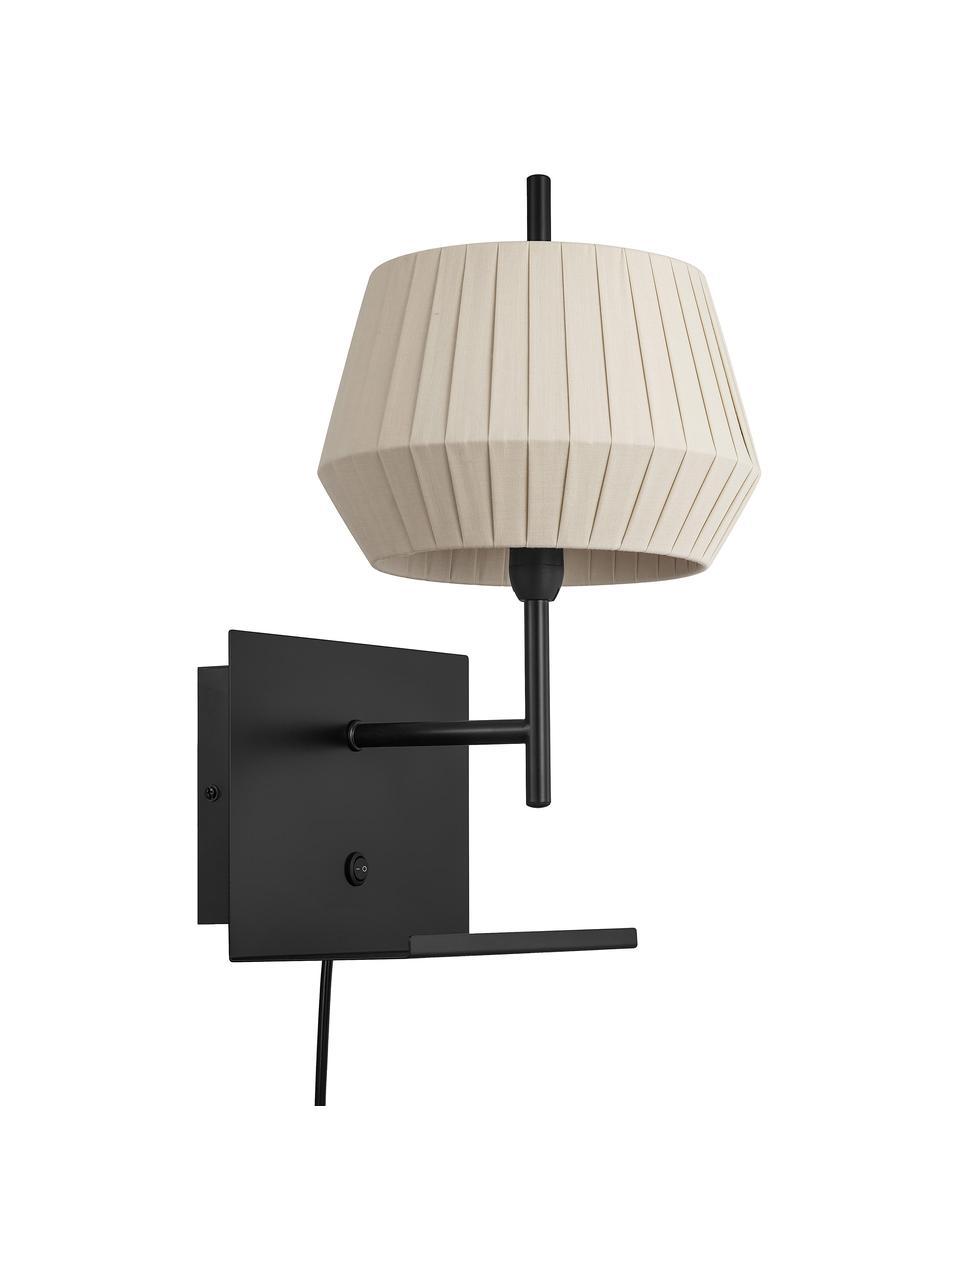 Klassische Wandleuchte Dicte mit Stecker, Lampenschirm: Stoff, Beige, Schwarz, 21 x 38 cm